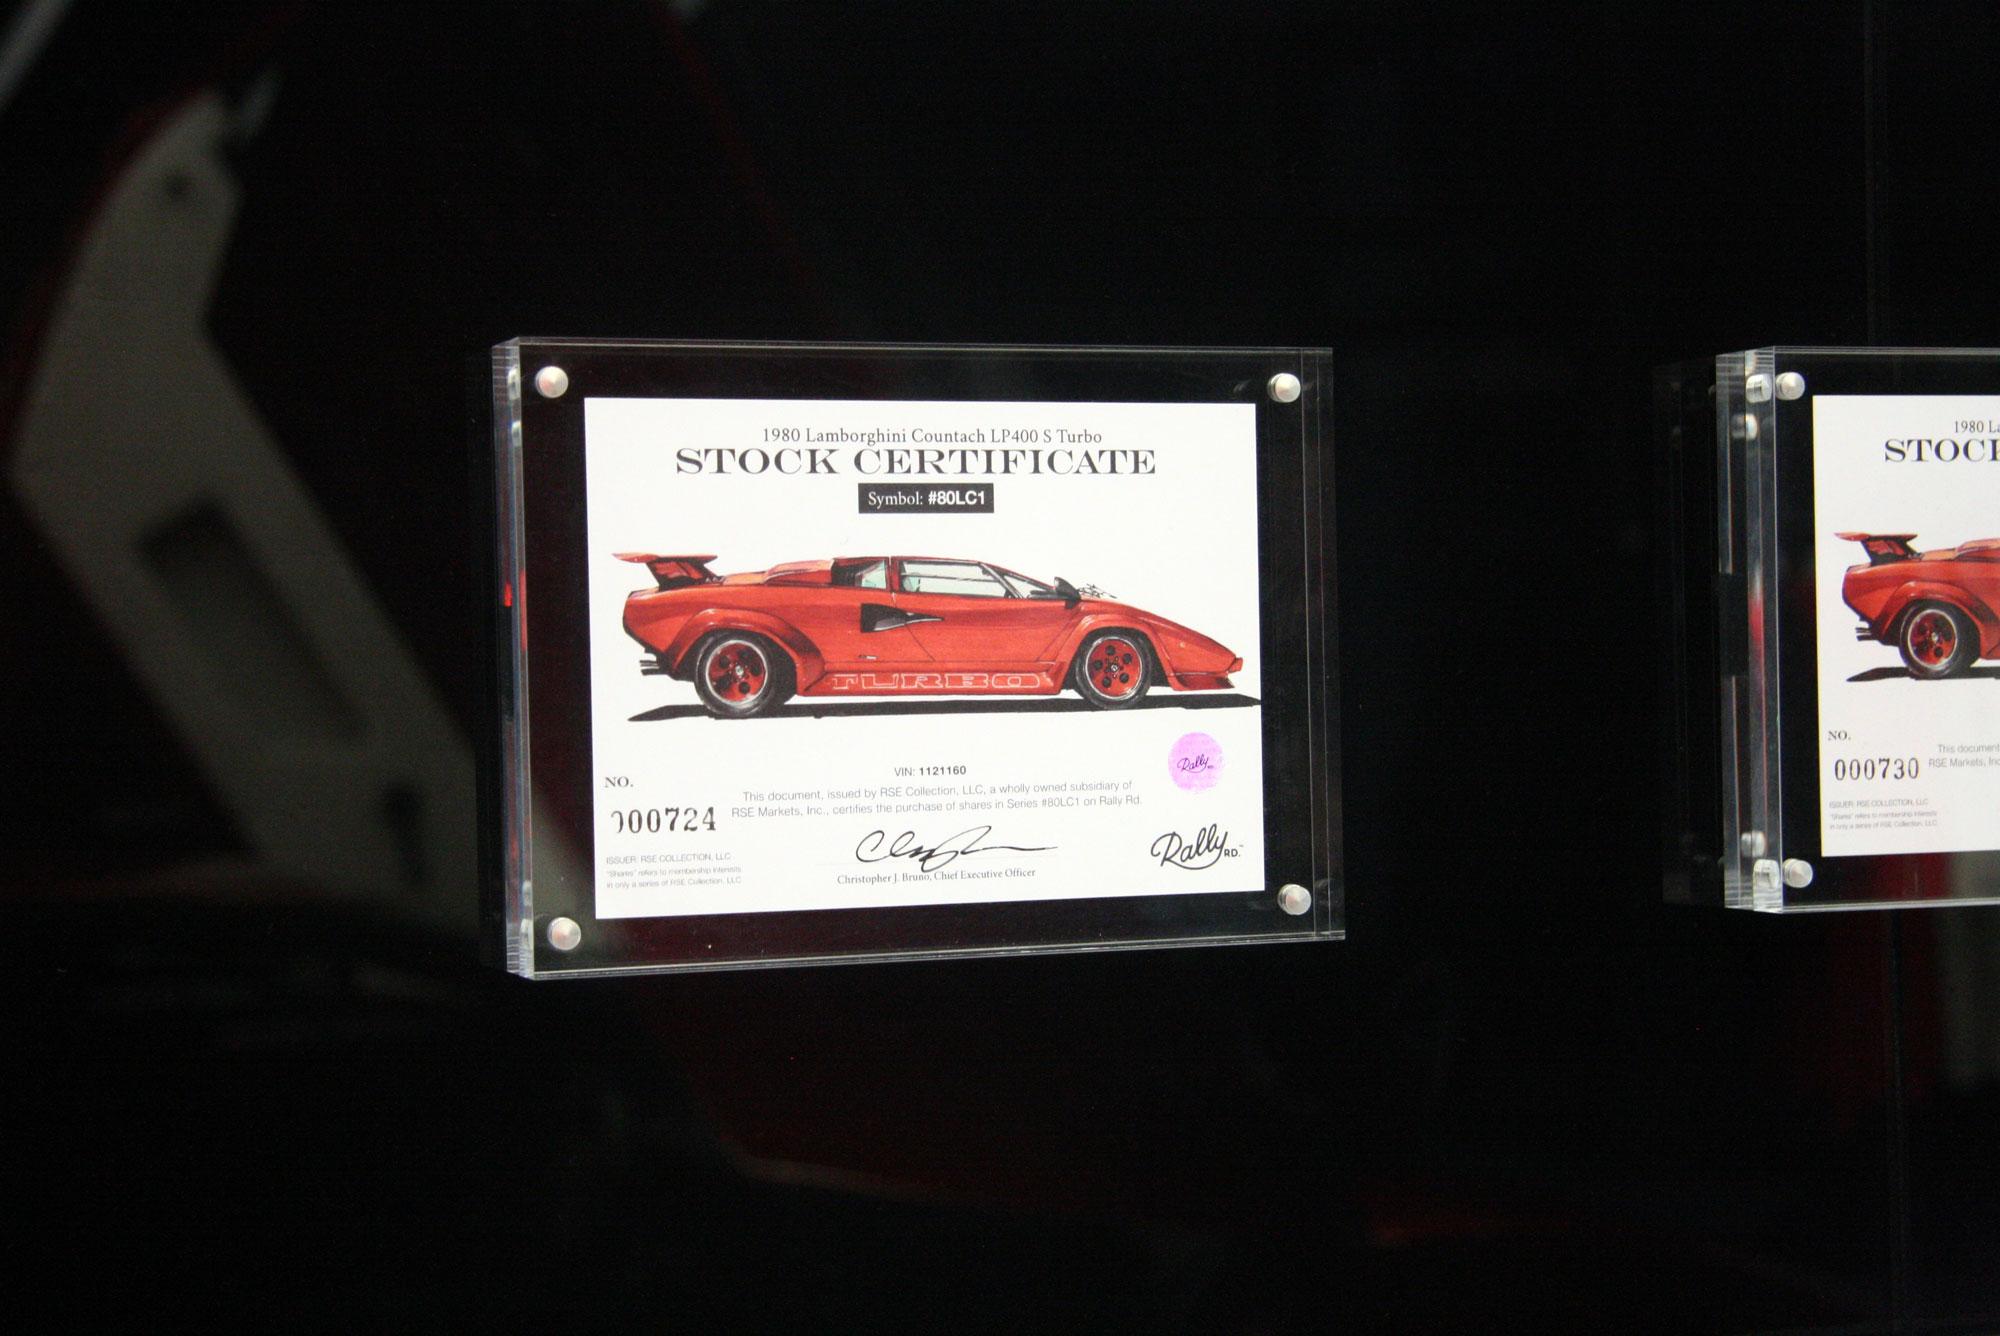 1980 Lamborghini Countach LP400 S Turbo plaque